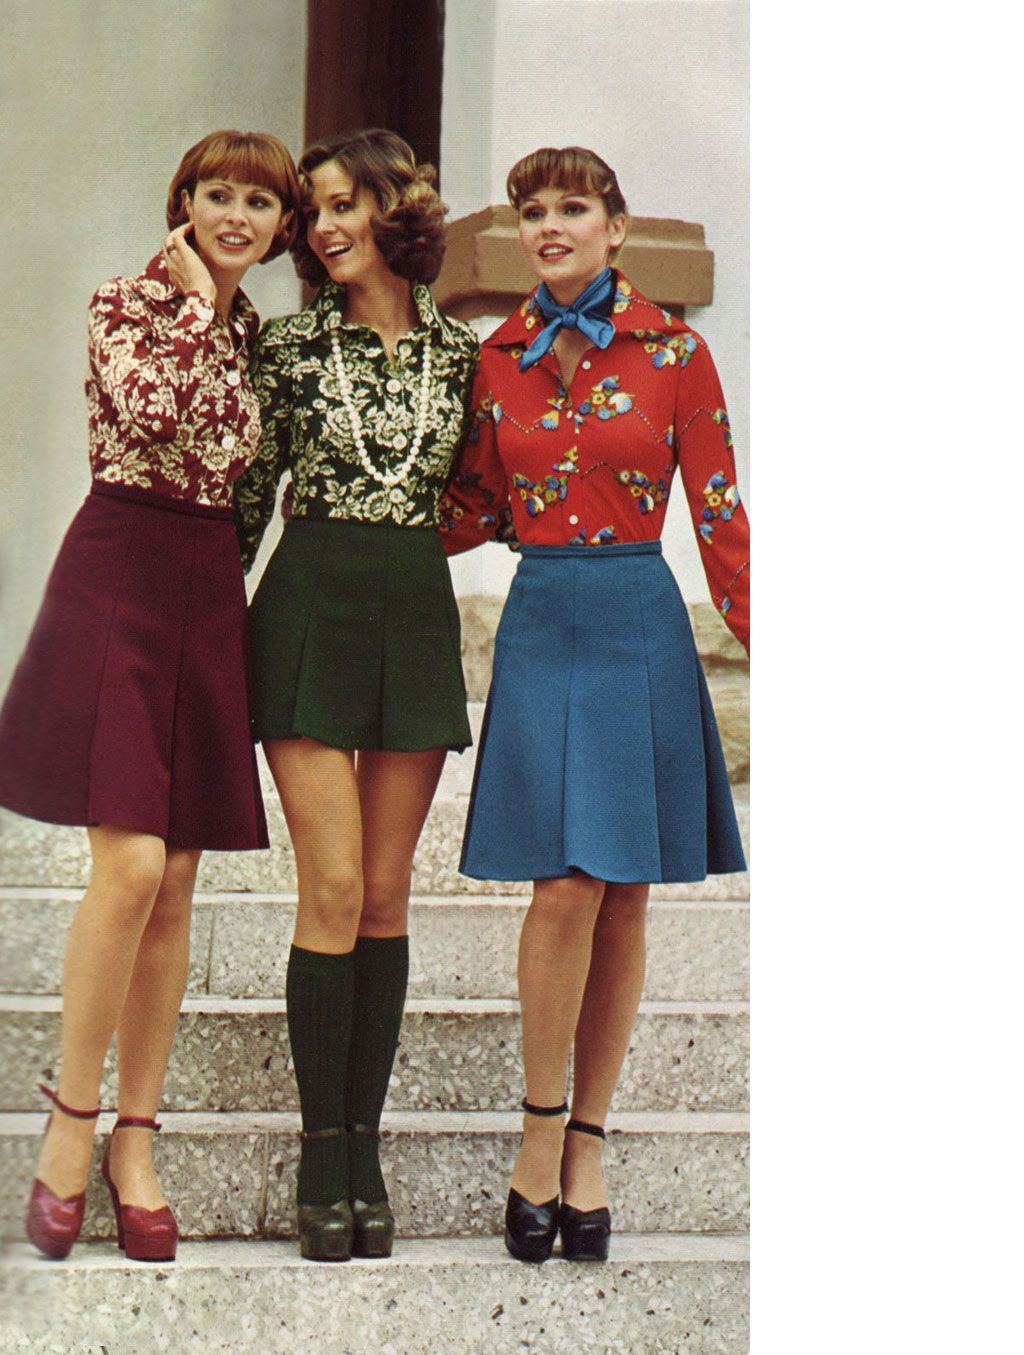 Pin by Sue Curtsinger on funky vibes  8s fashion, Retro fashion